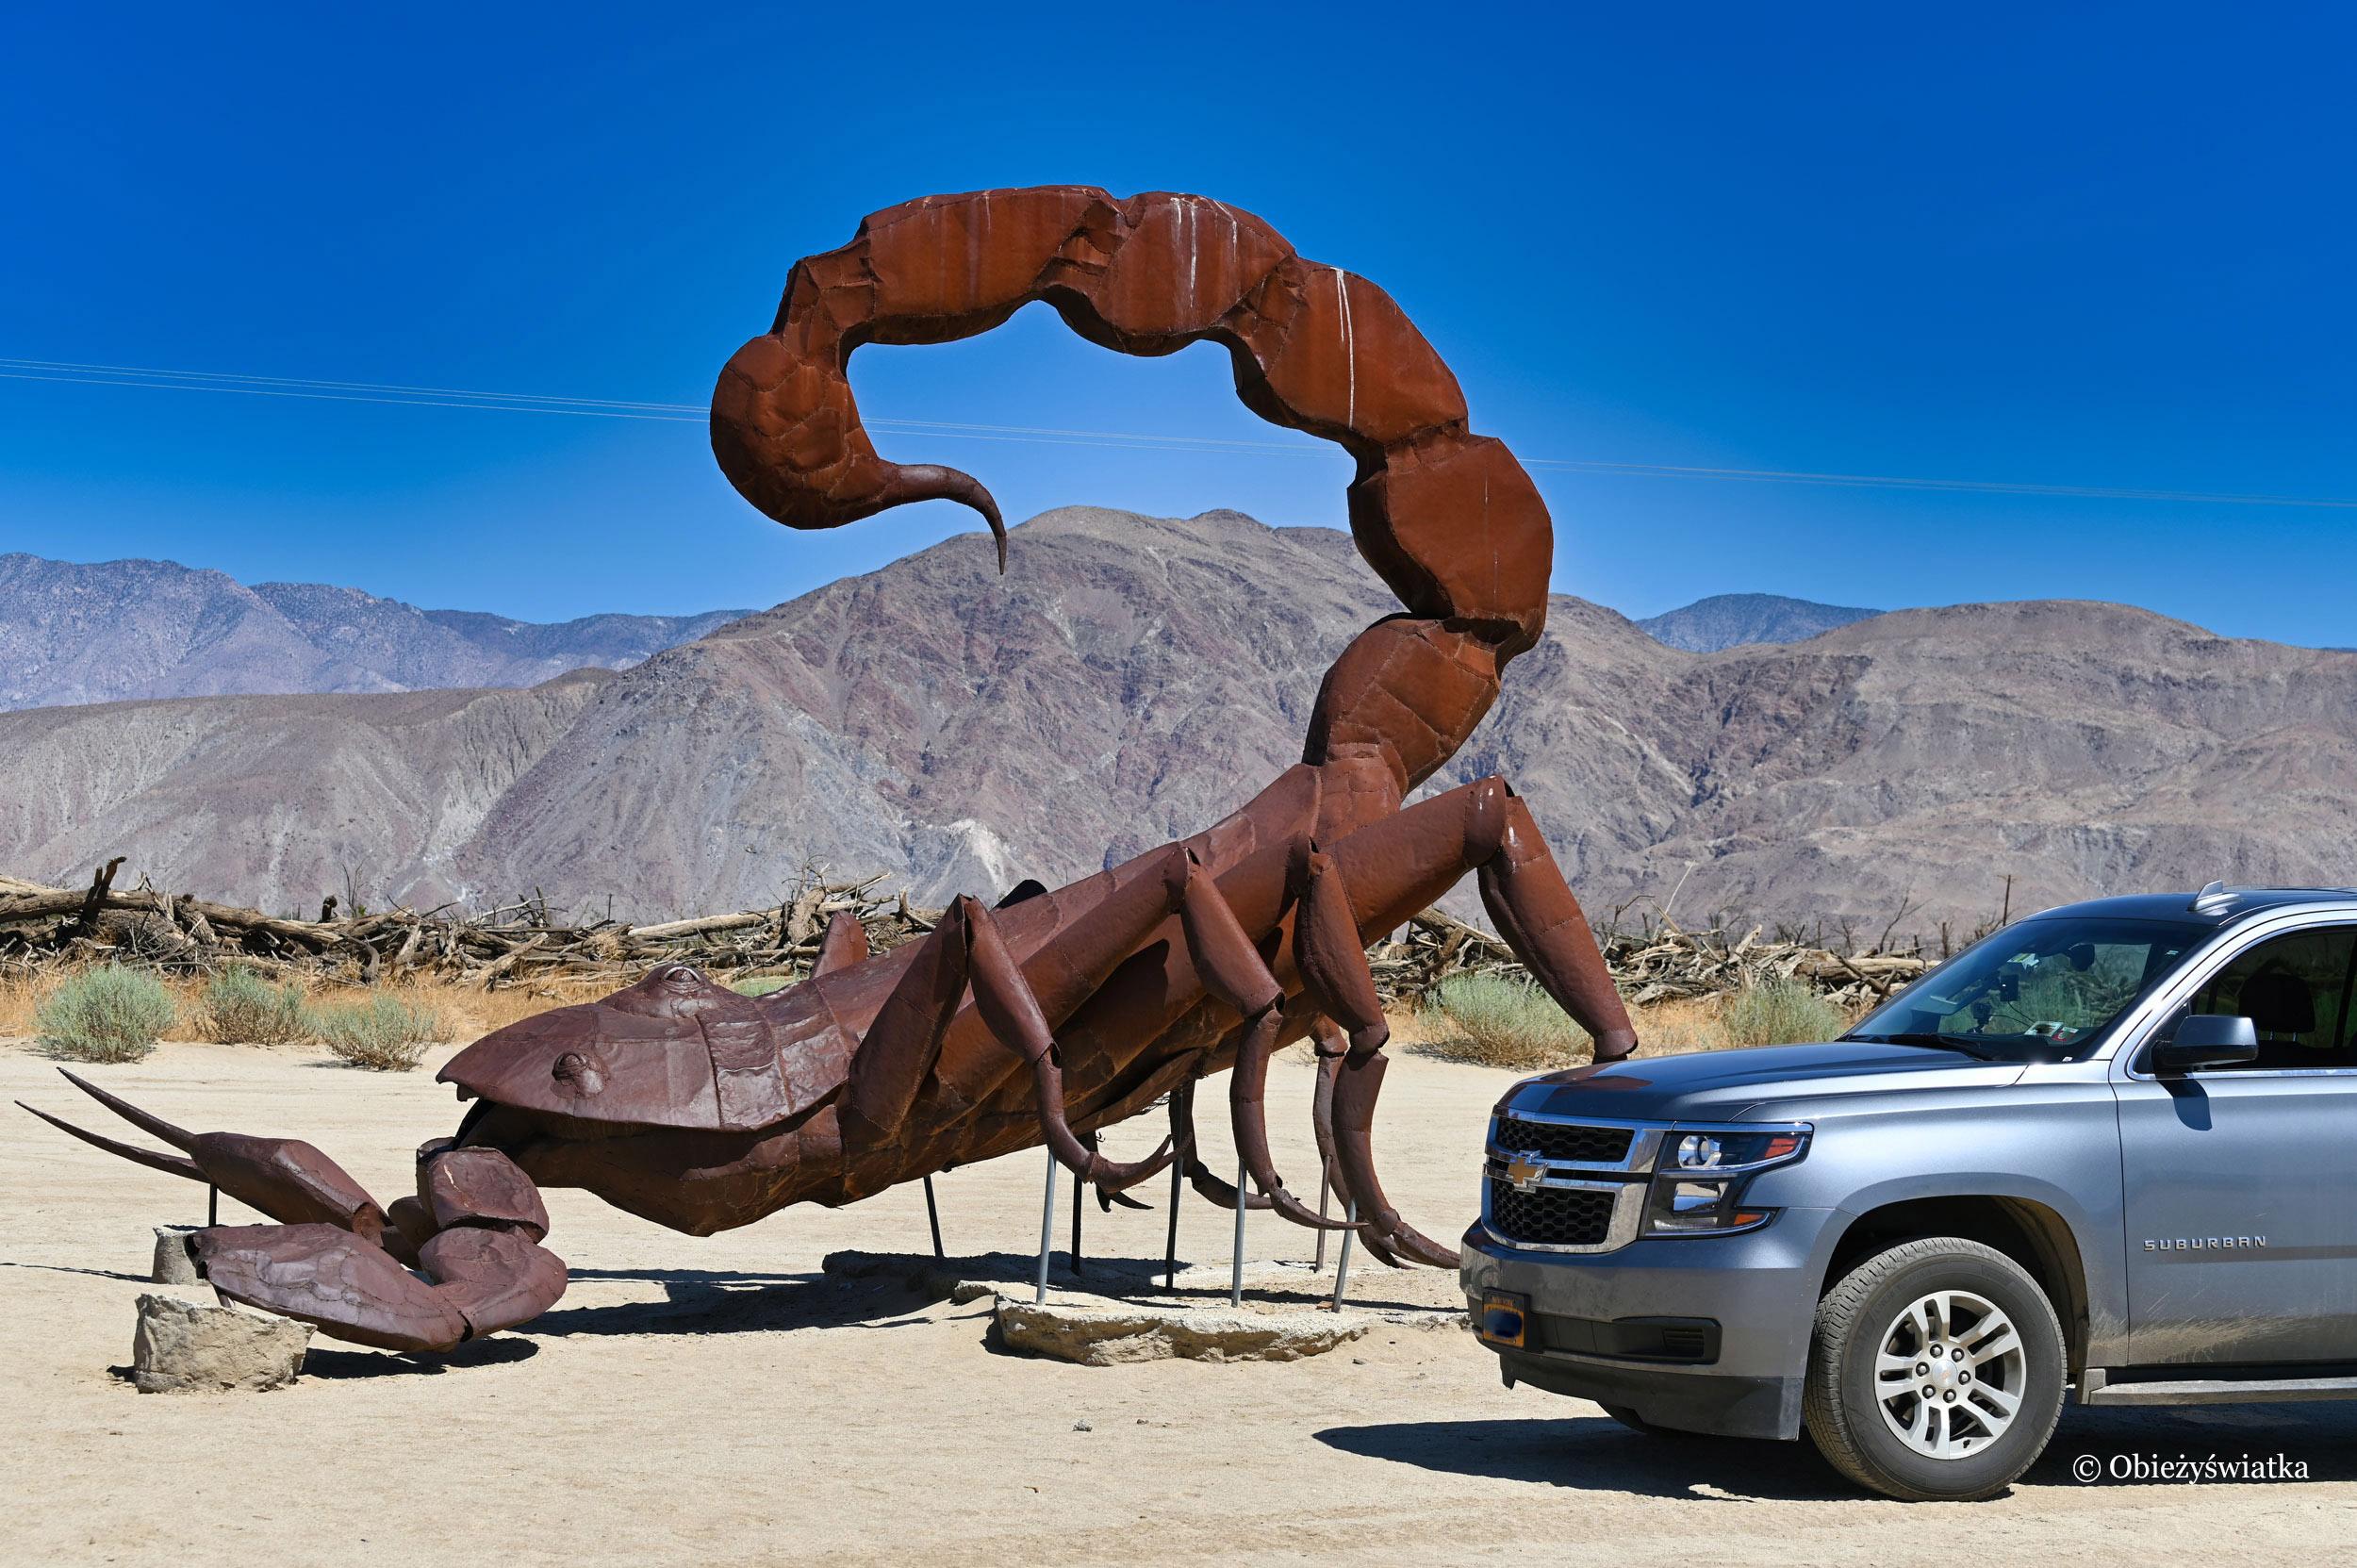 Ogromne rzeźby w Borrego Springs, Kalifornia